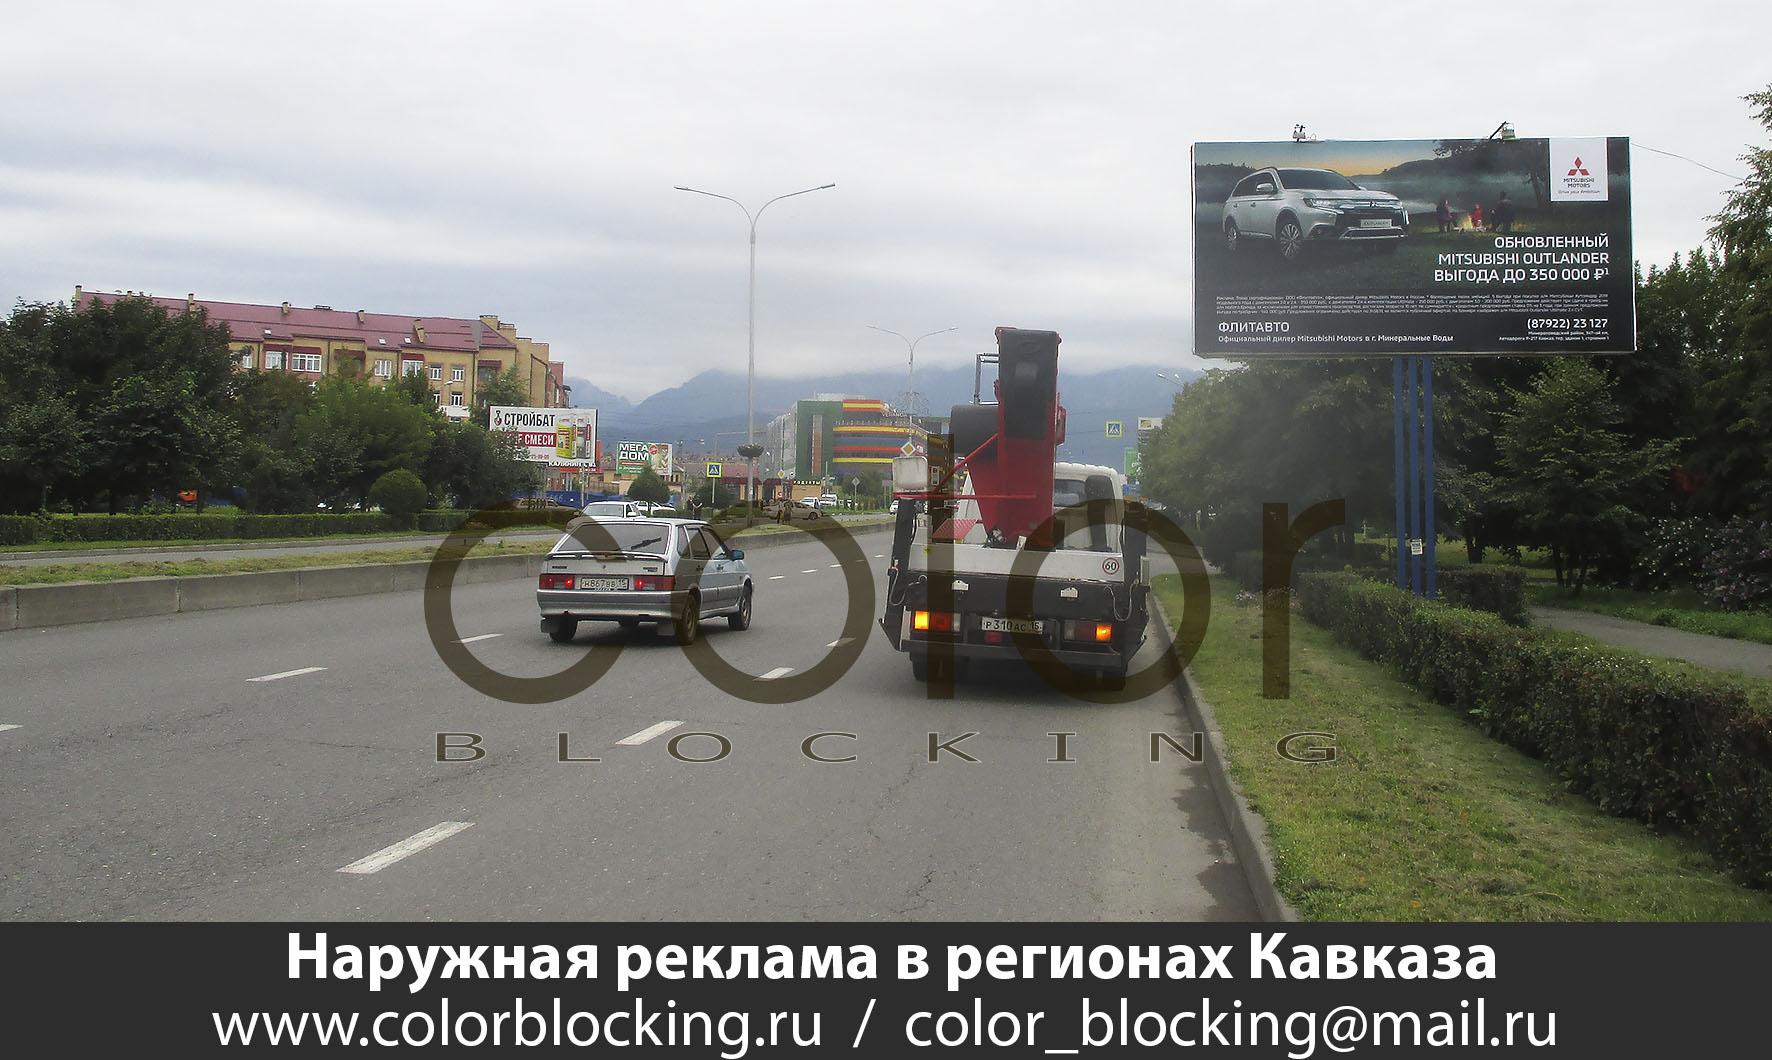 Реклама на билбордах в регионах Кавказа Владикавказ